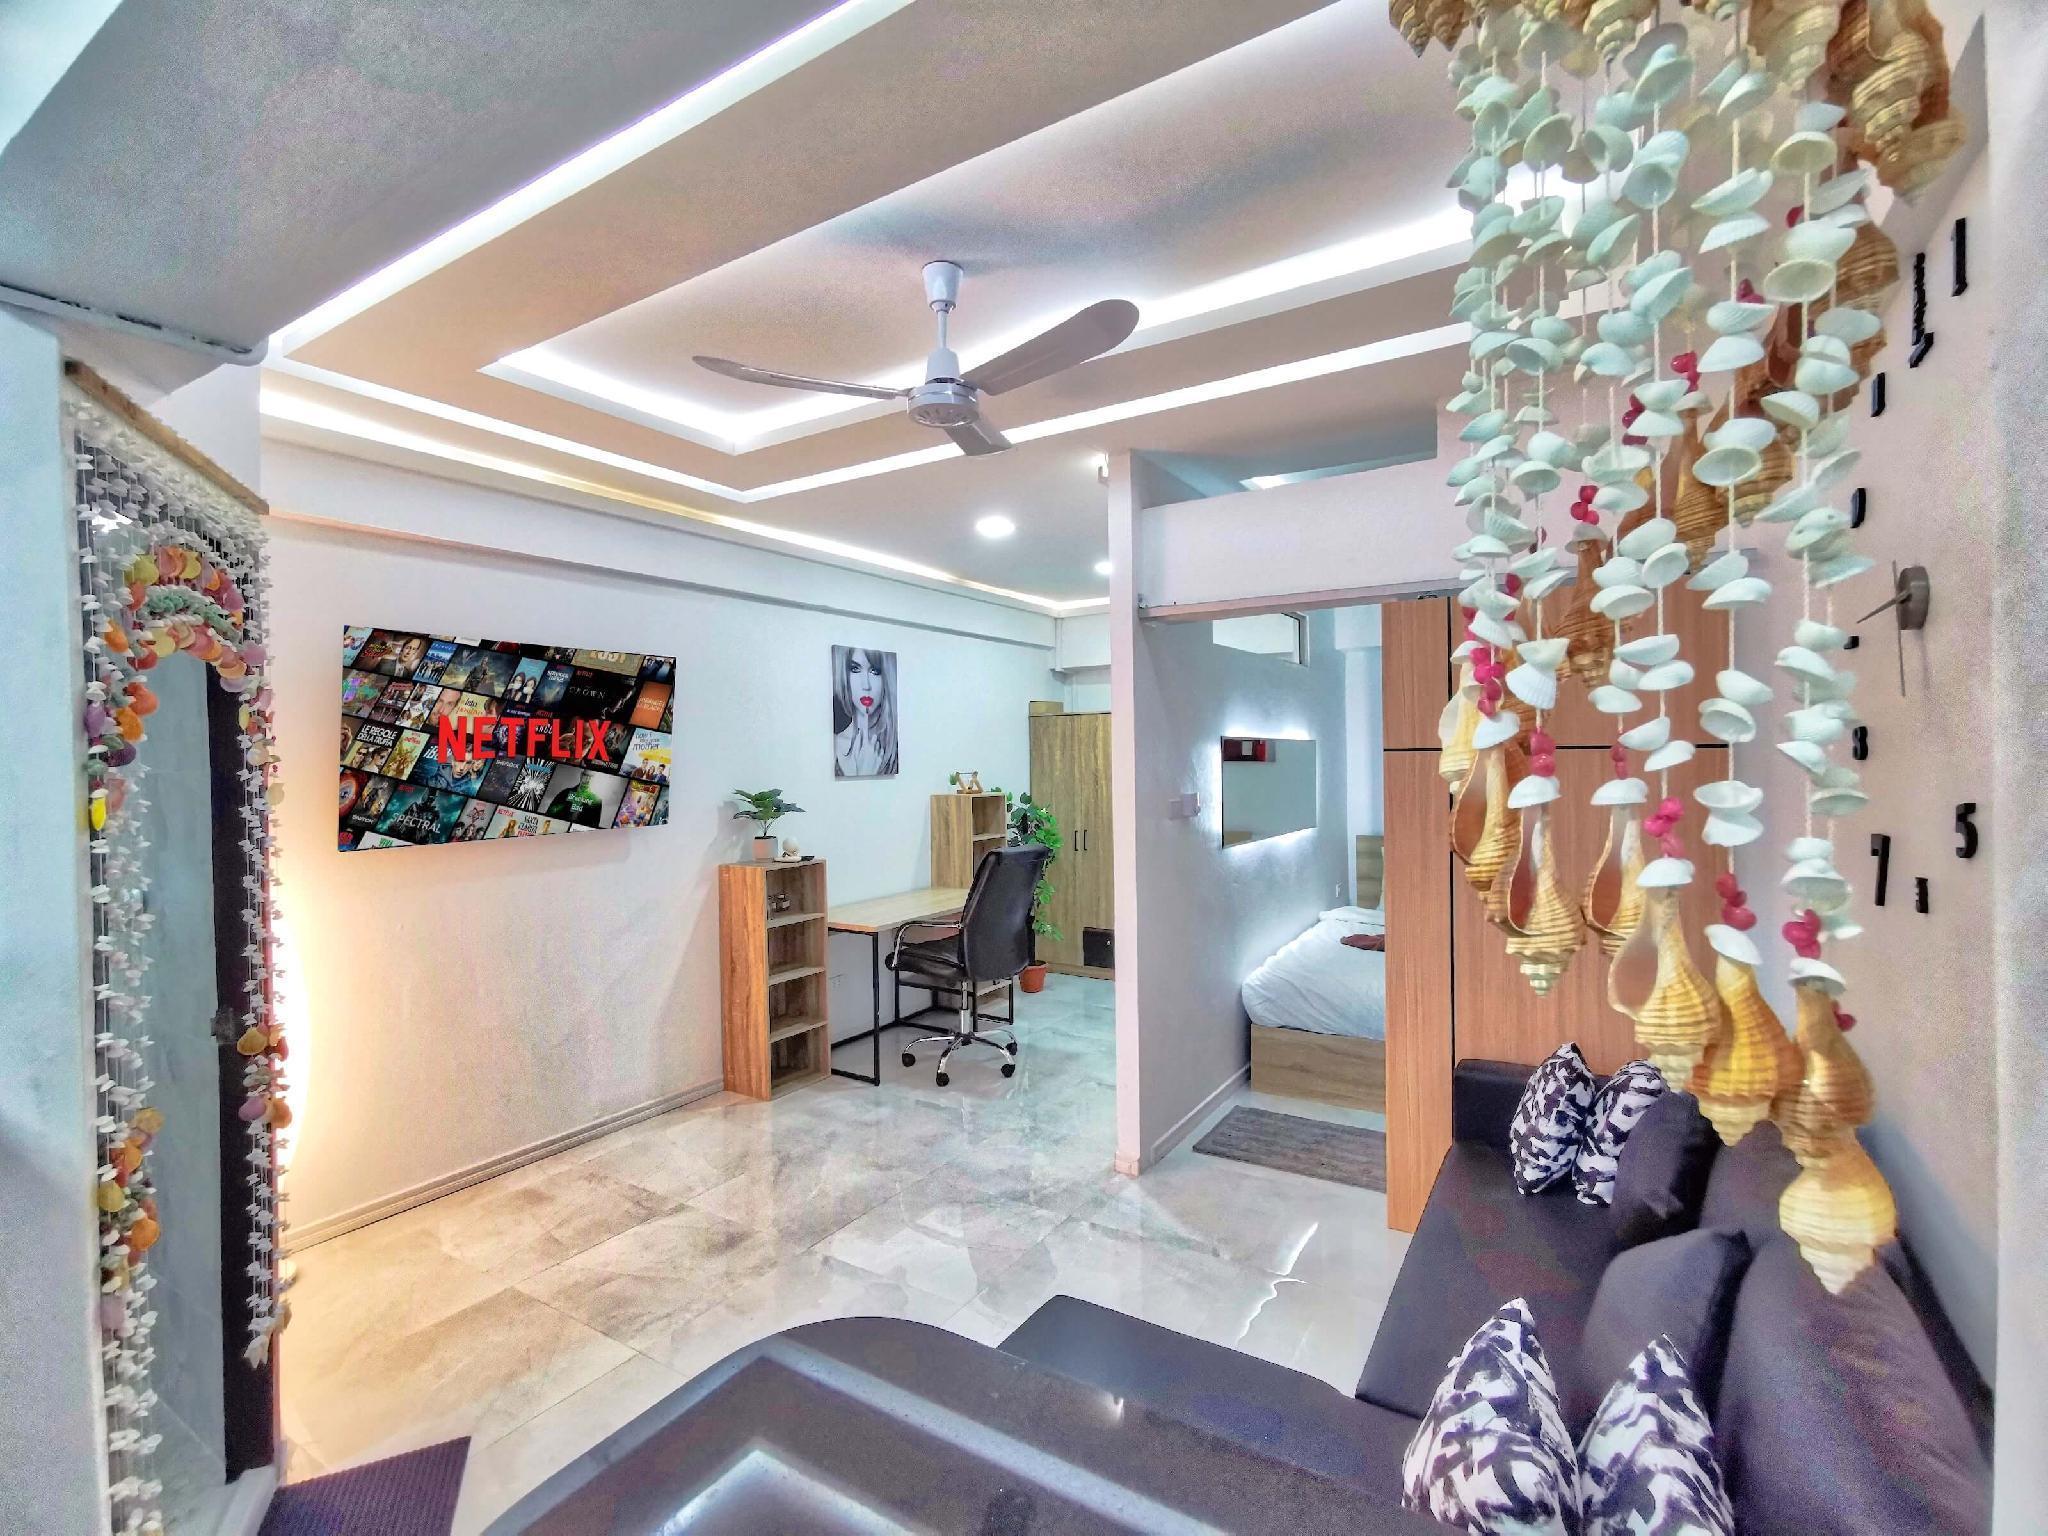 Hagone-Condotel Pattaya อพาร์ตเมนต์ 1 ห้องนอน 1 ห้องน้ำส่วนตัว ขนาด 40 ตร.ม. – เทพประสิทธิ์